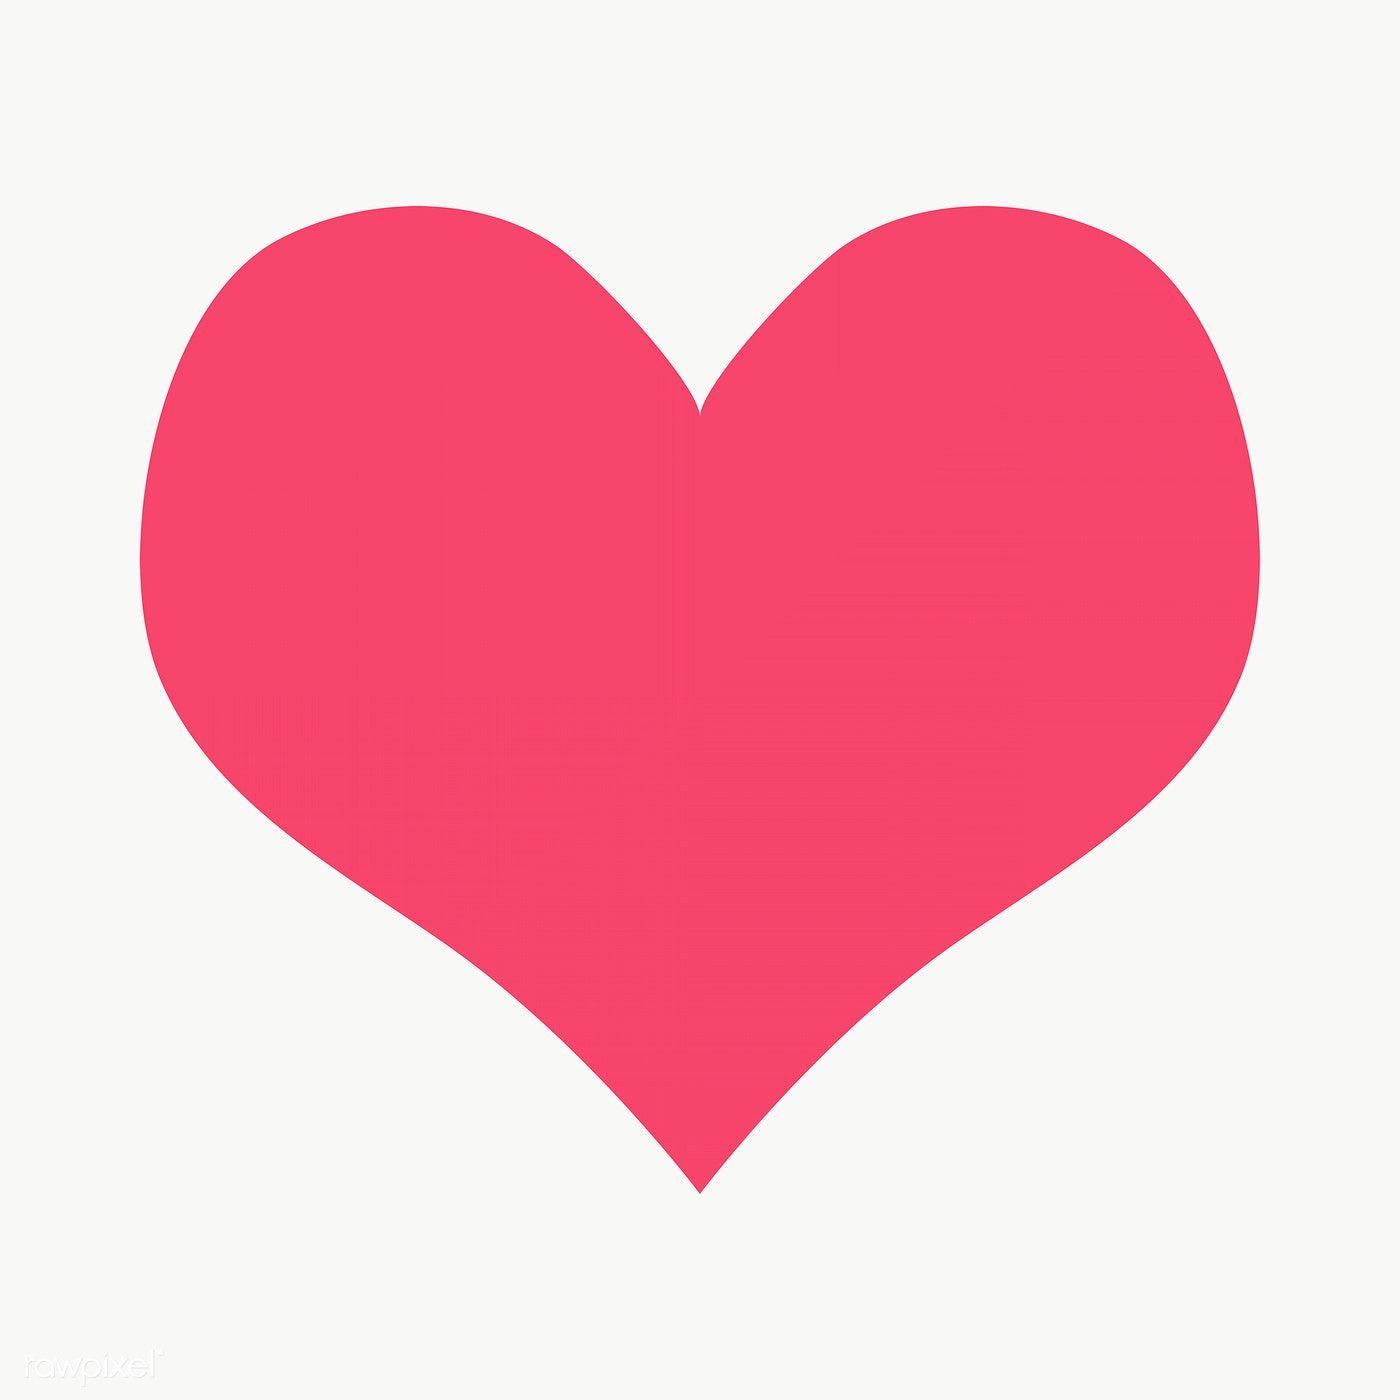 Pink Heart Geometric Shape Transparent Png Free Image By Rawpixel Com Ningzk V Geometric Shapes Geometric Star Printable Designs